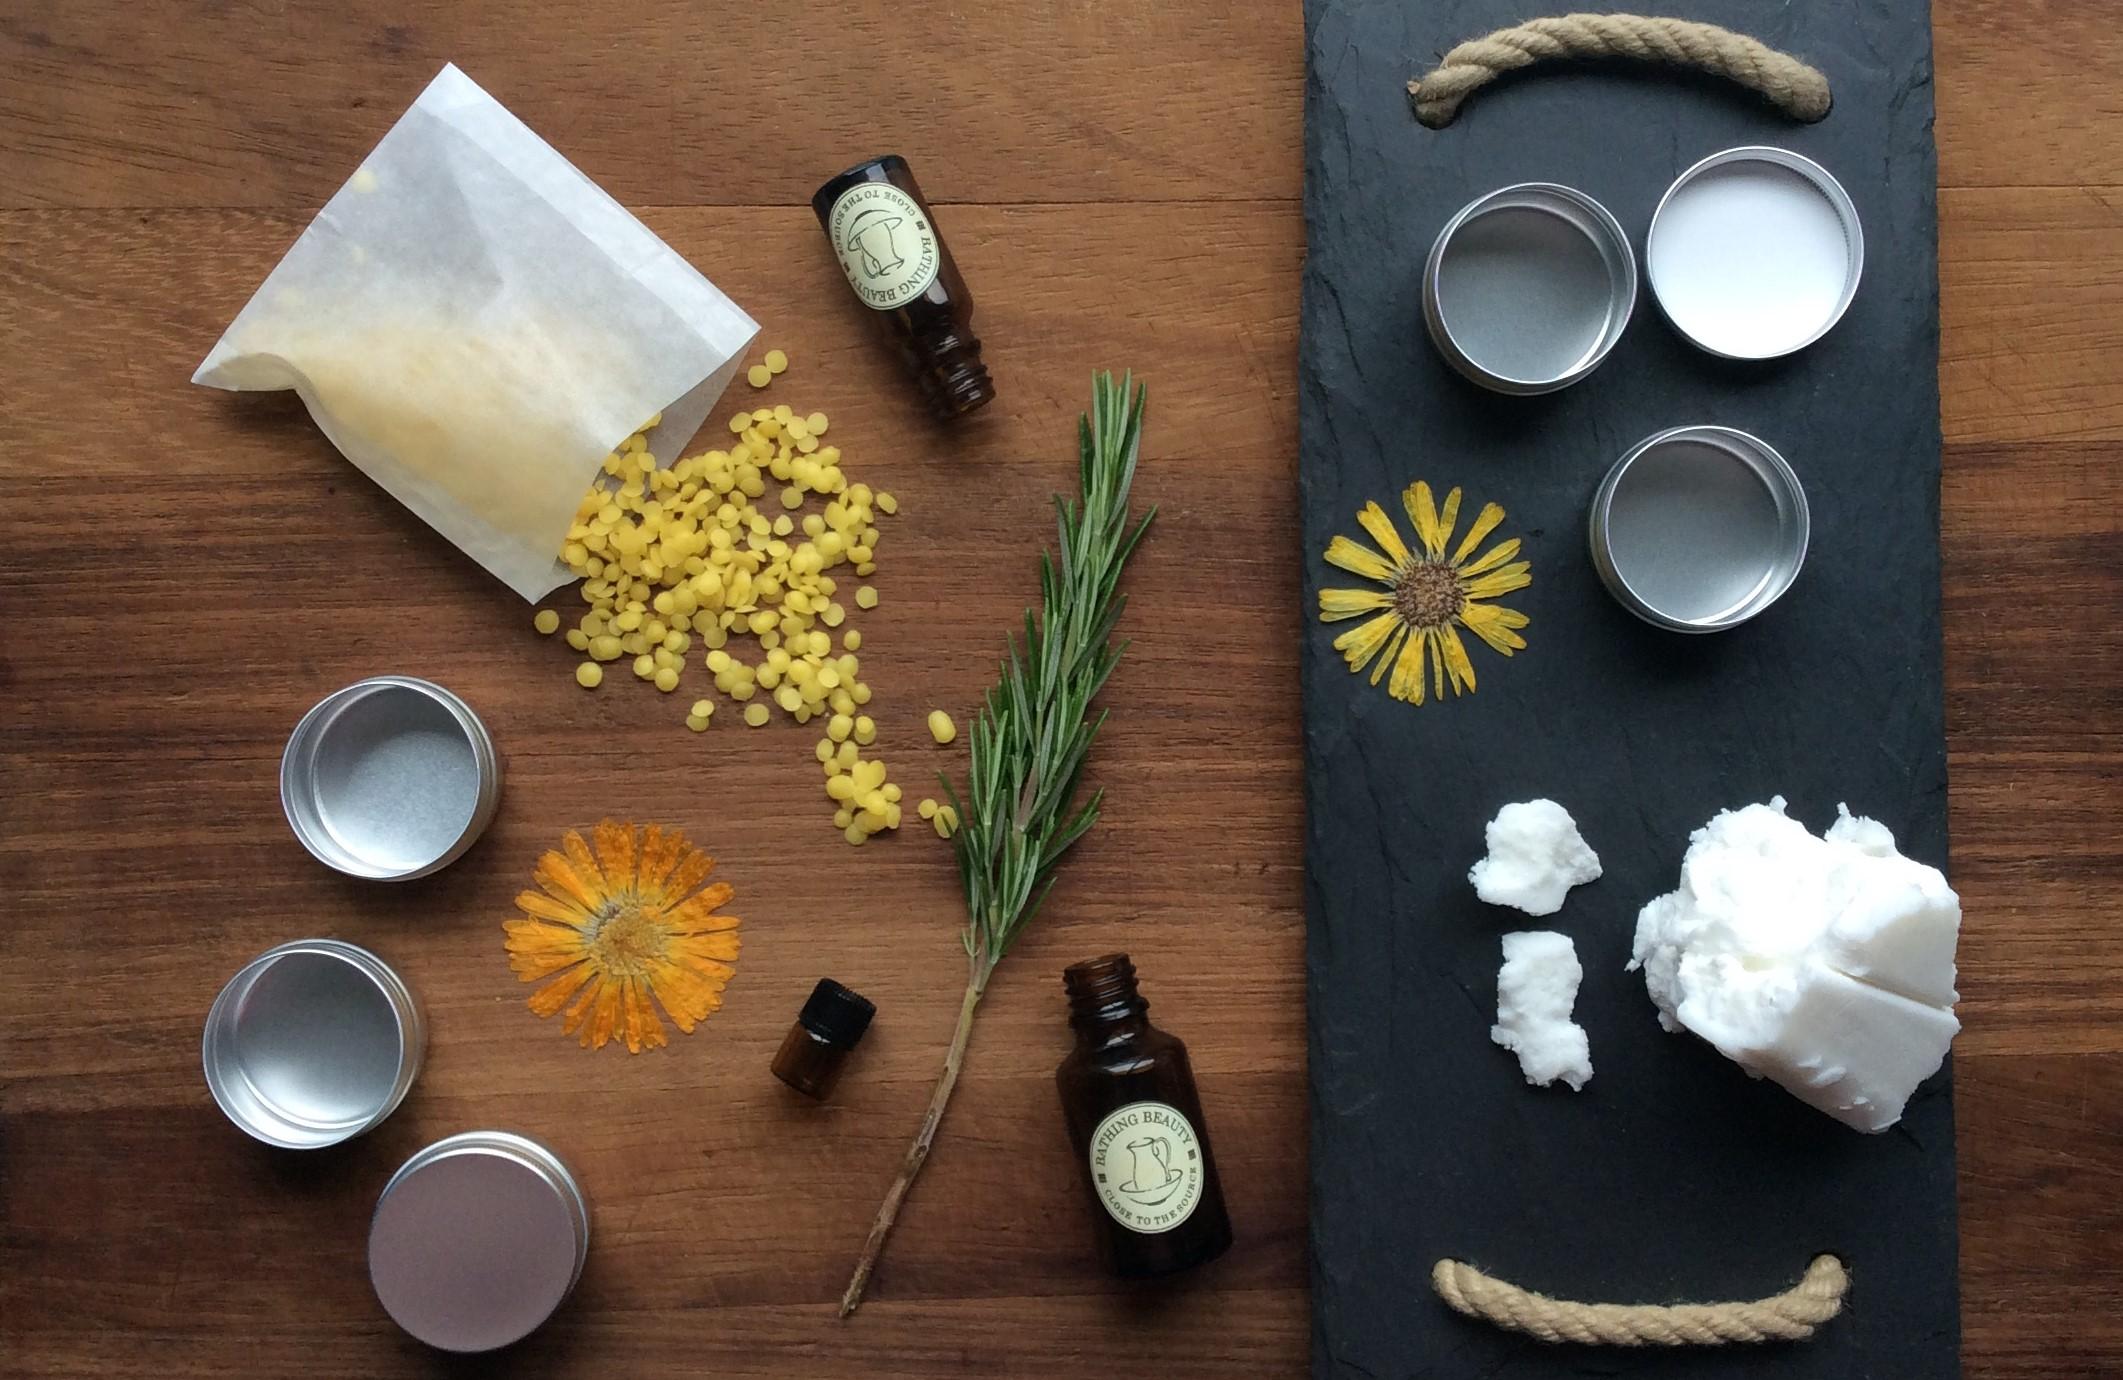 Bathing Beauty Ingredients